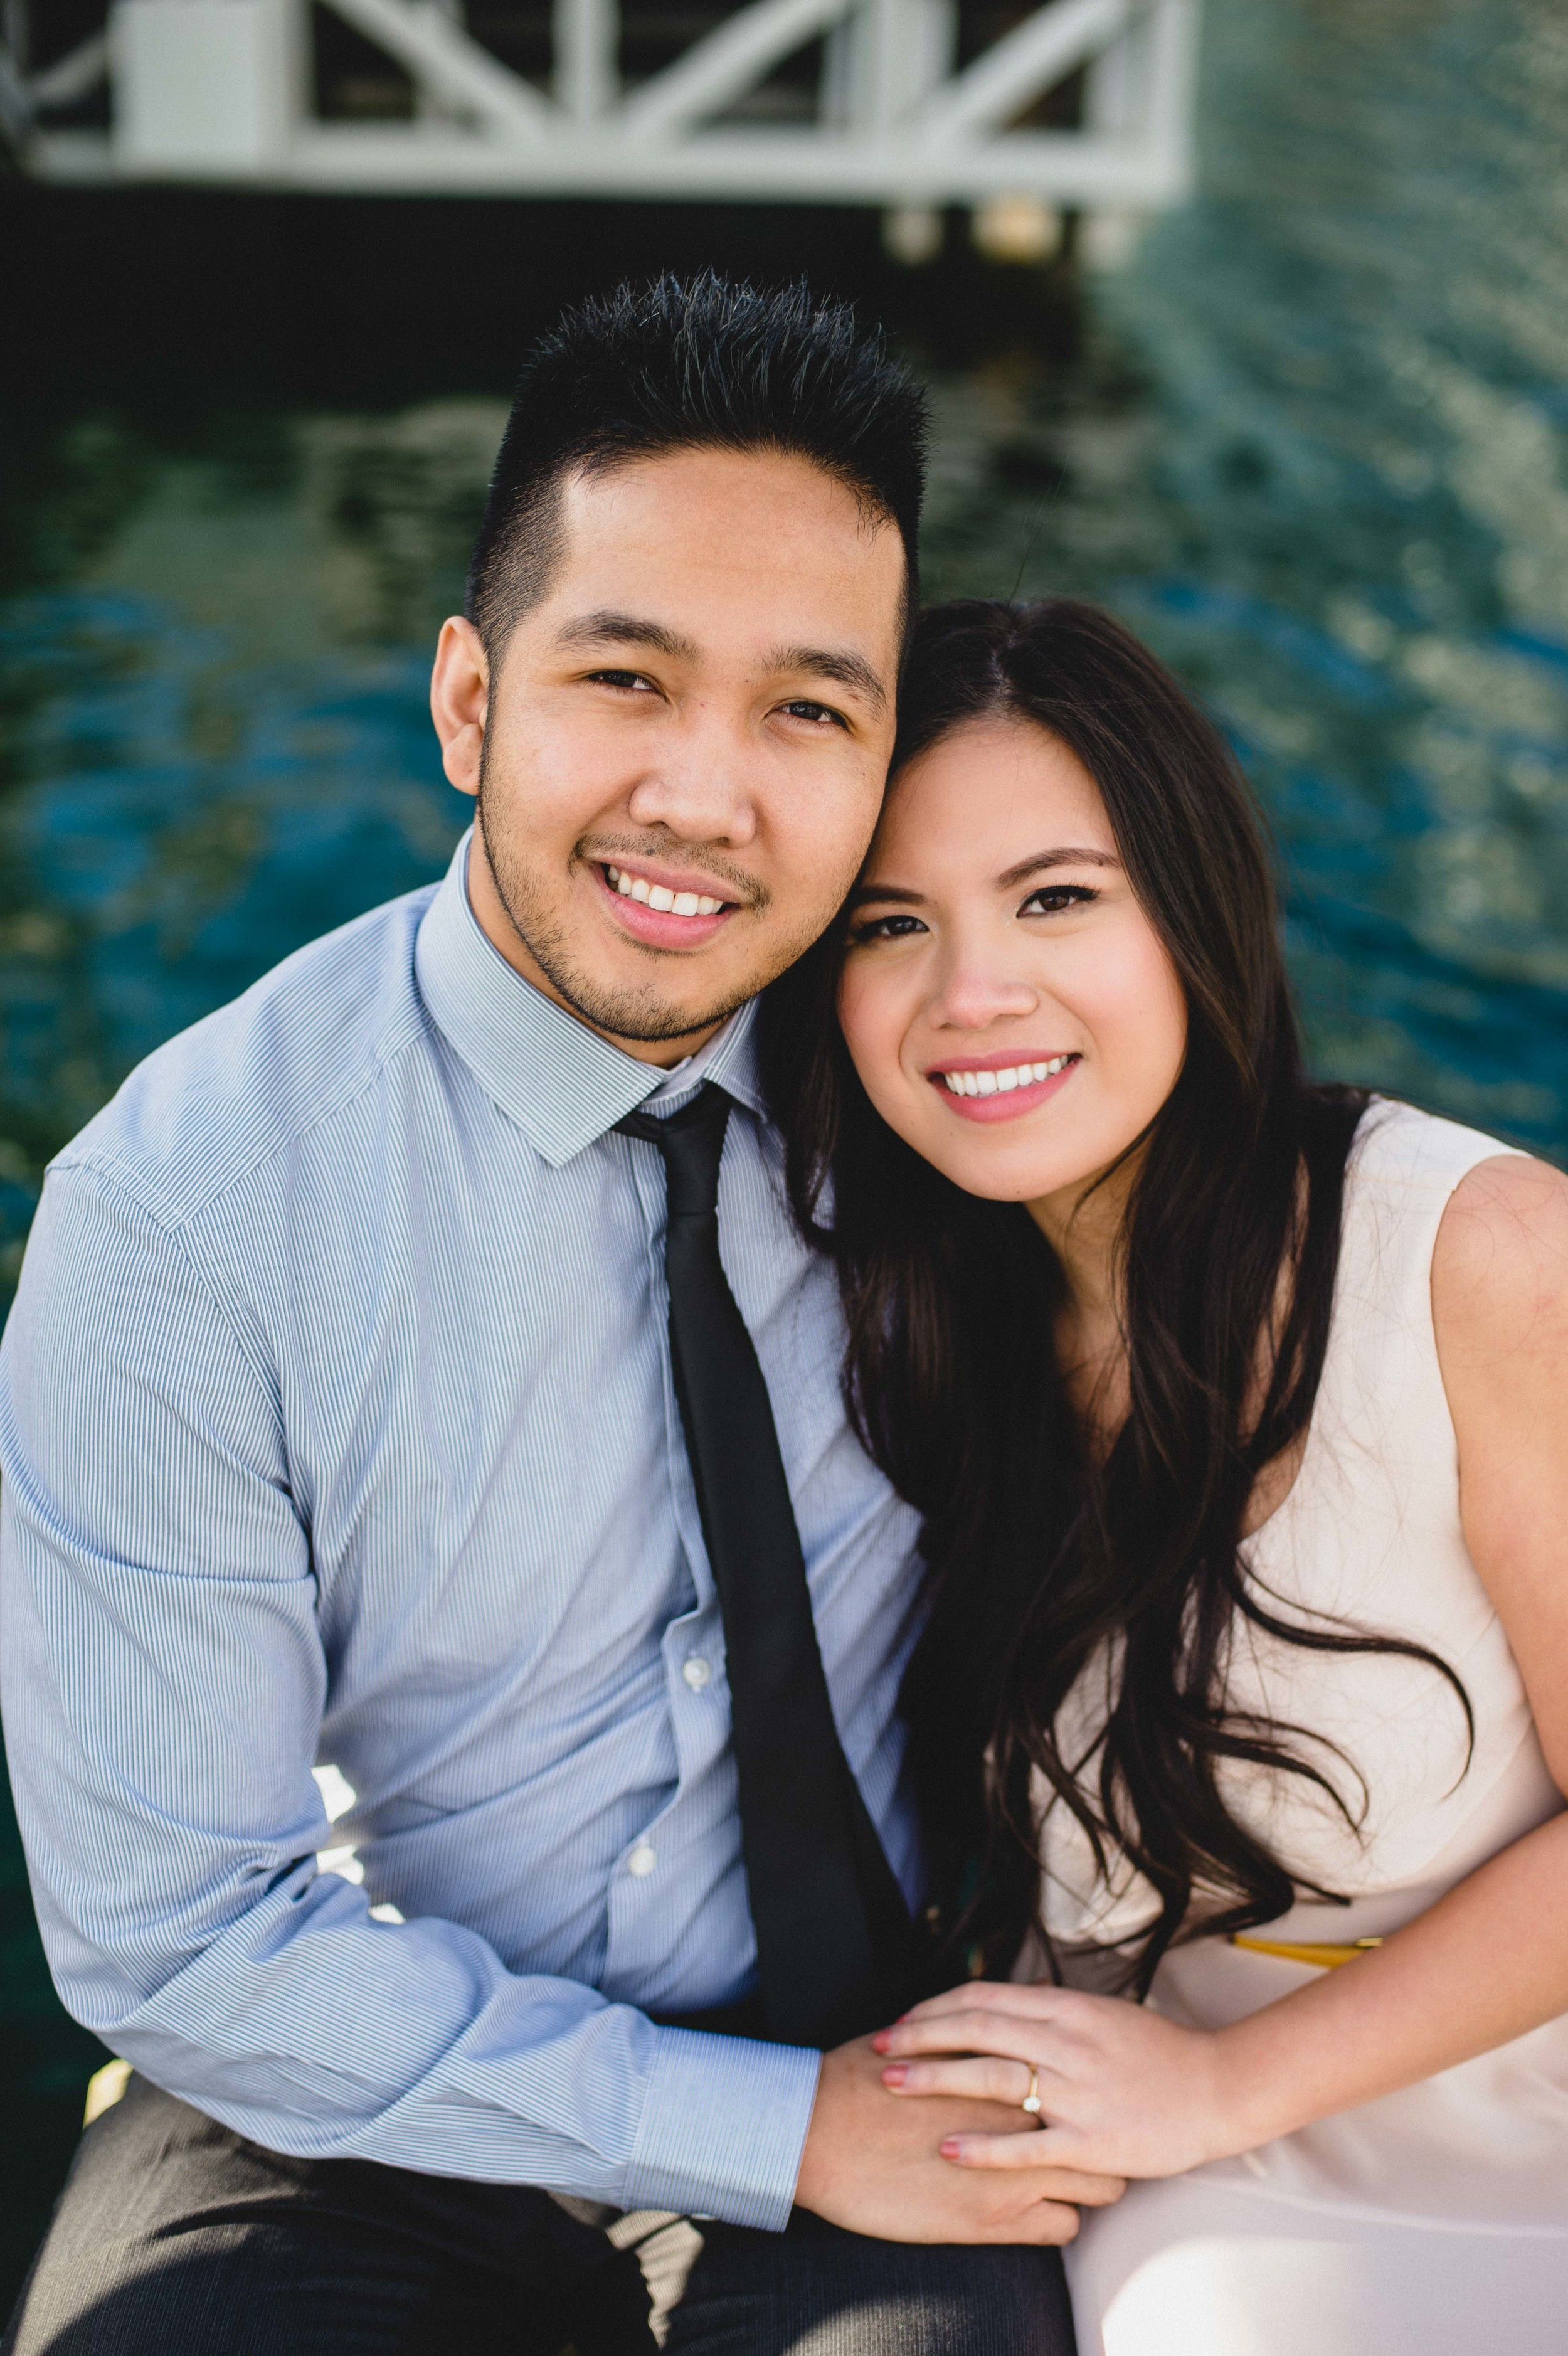 Vancouver David Lam Park Wedding Photographer Edward Lai Photography-3.jpg